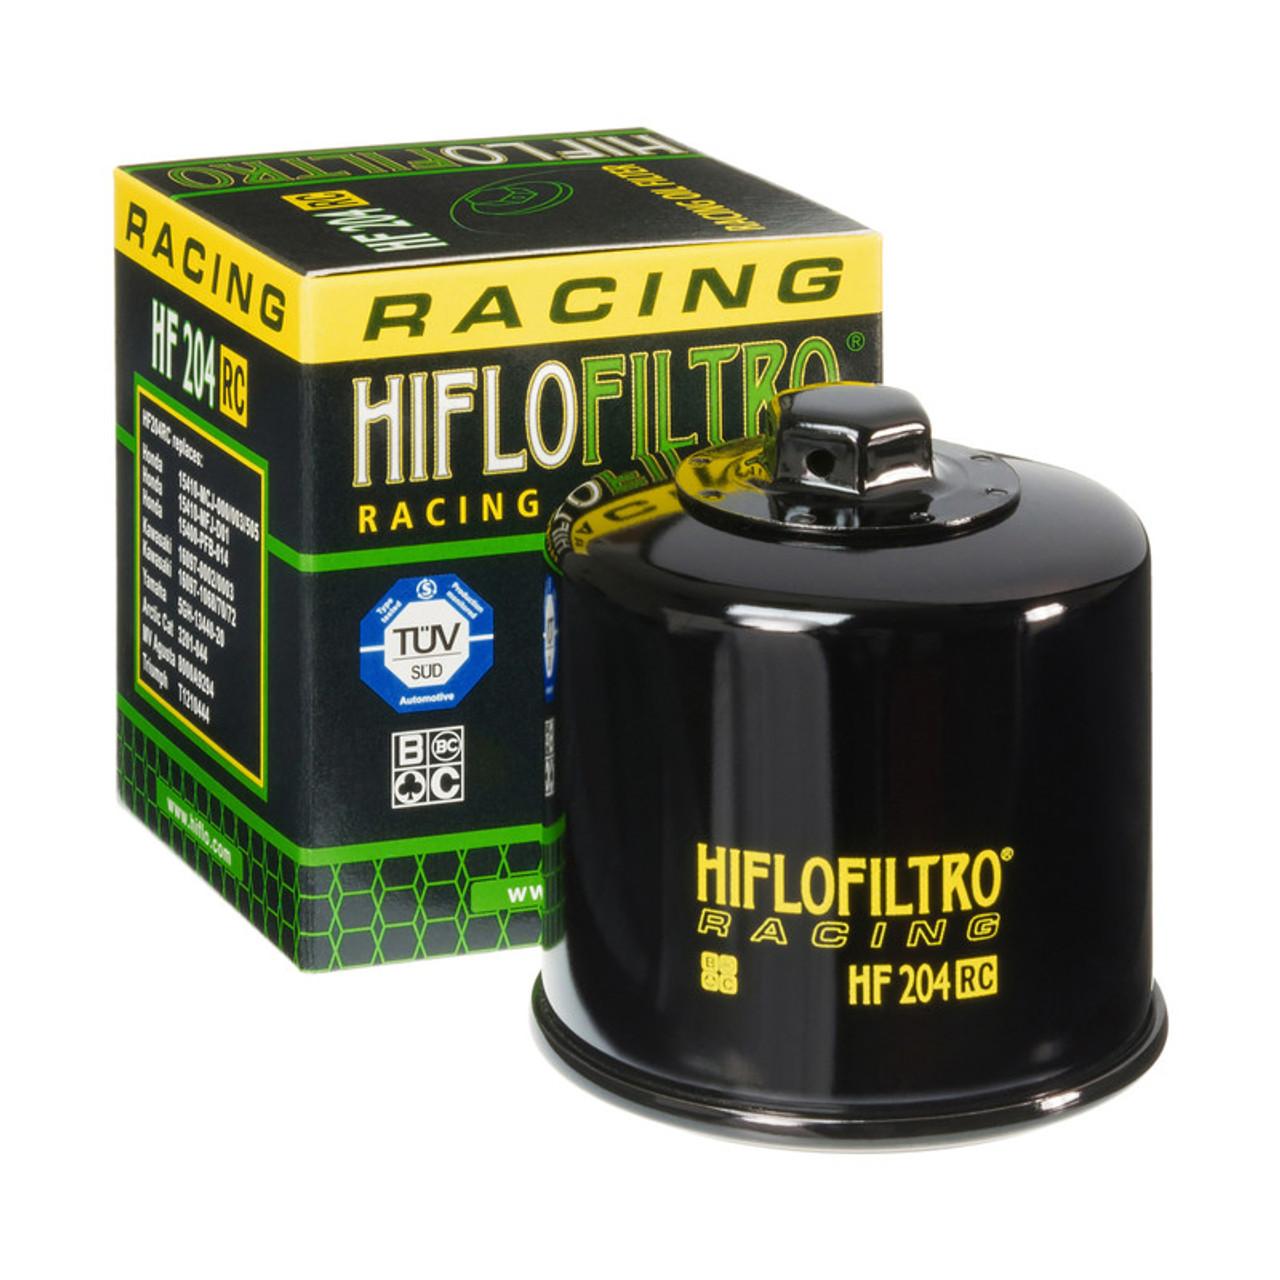 Hiflofiltro Racing Oil Filter Yamaha YZF-R6 06-19 HF204RC